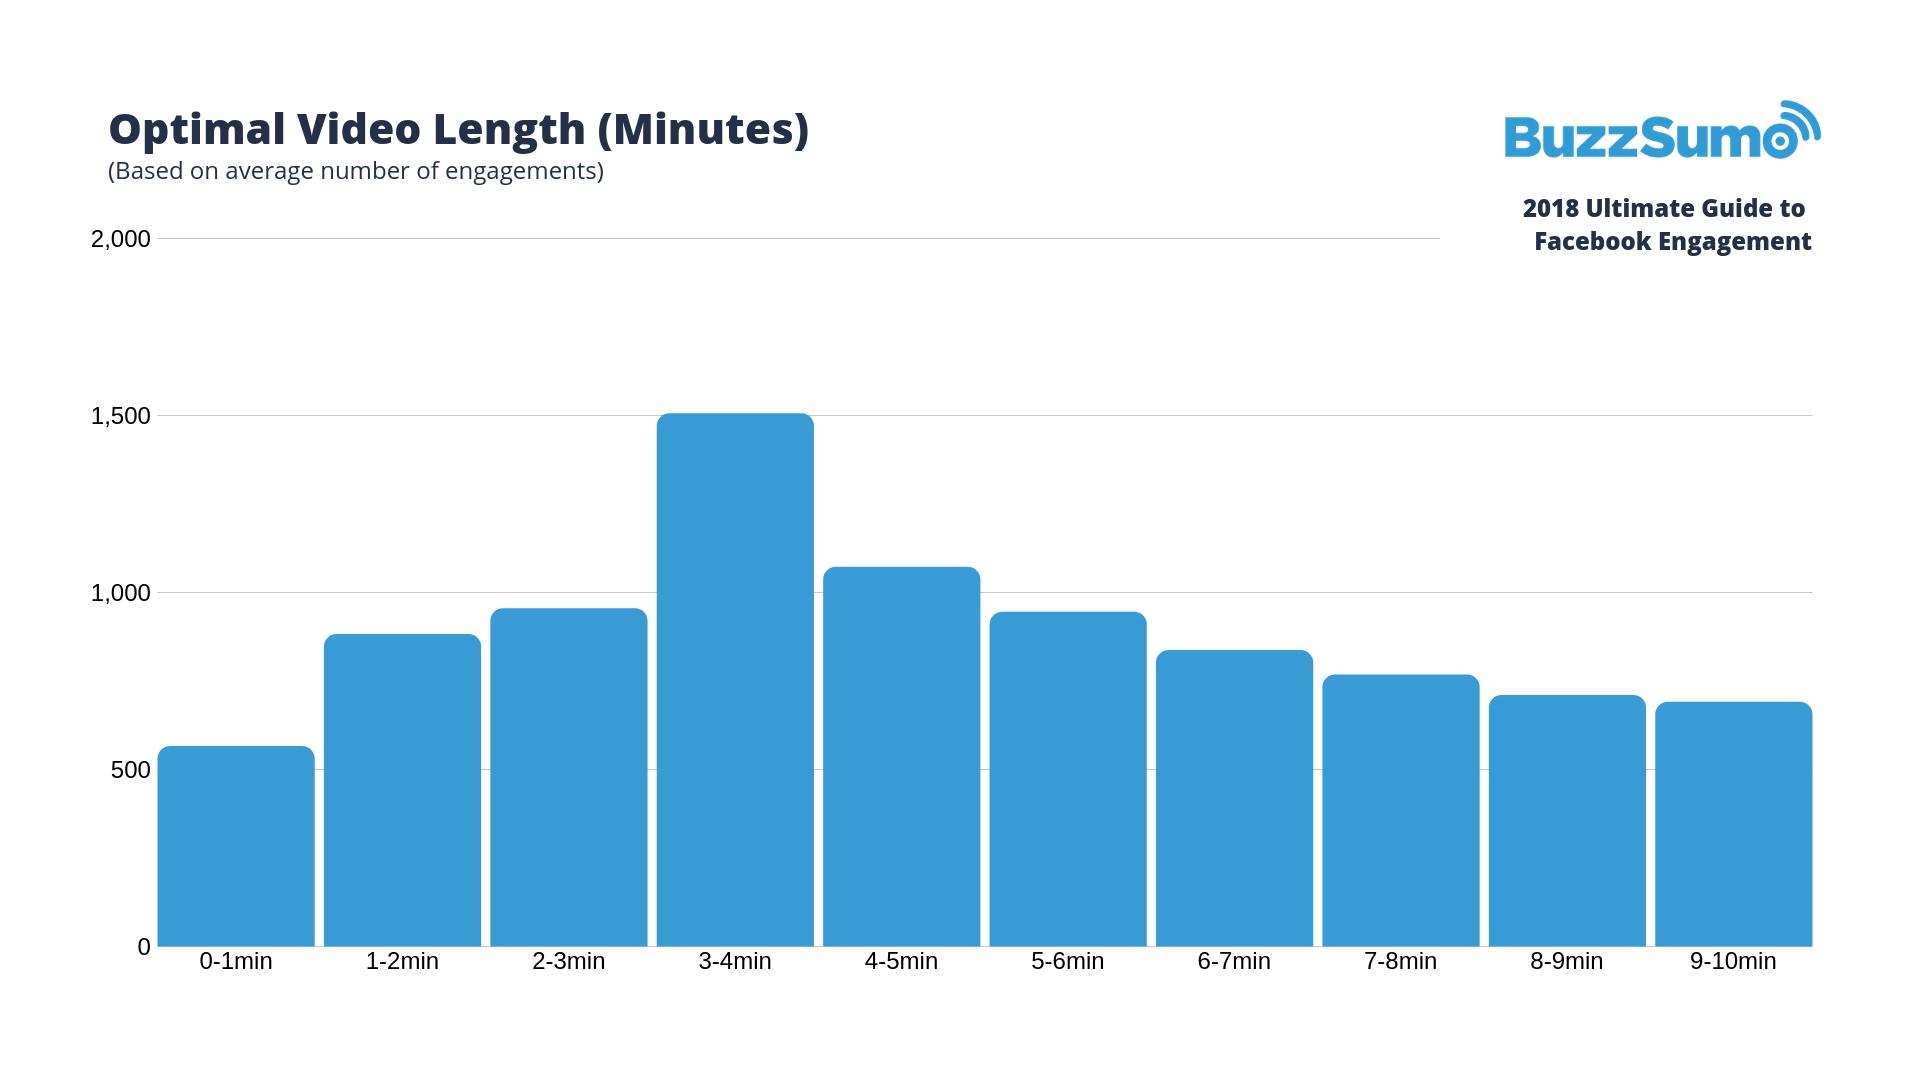 optimal video length for facebook engagement